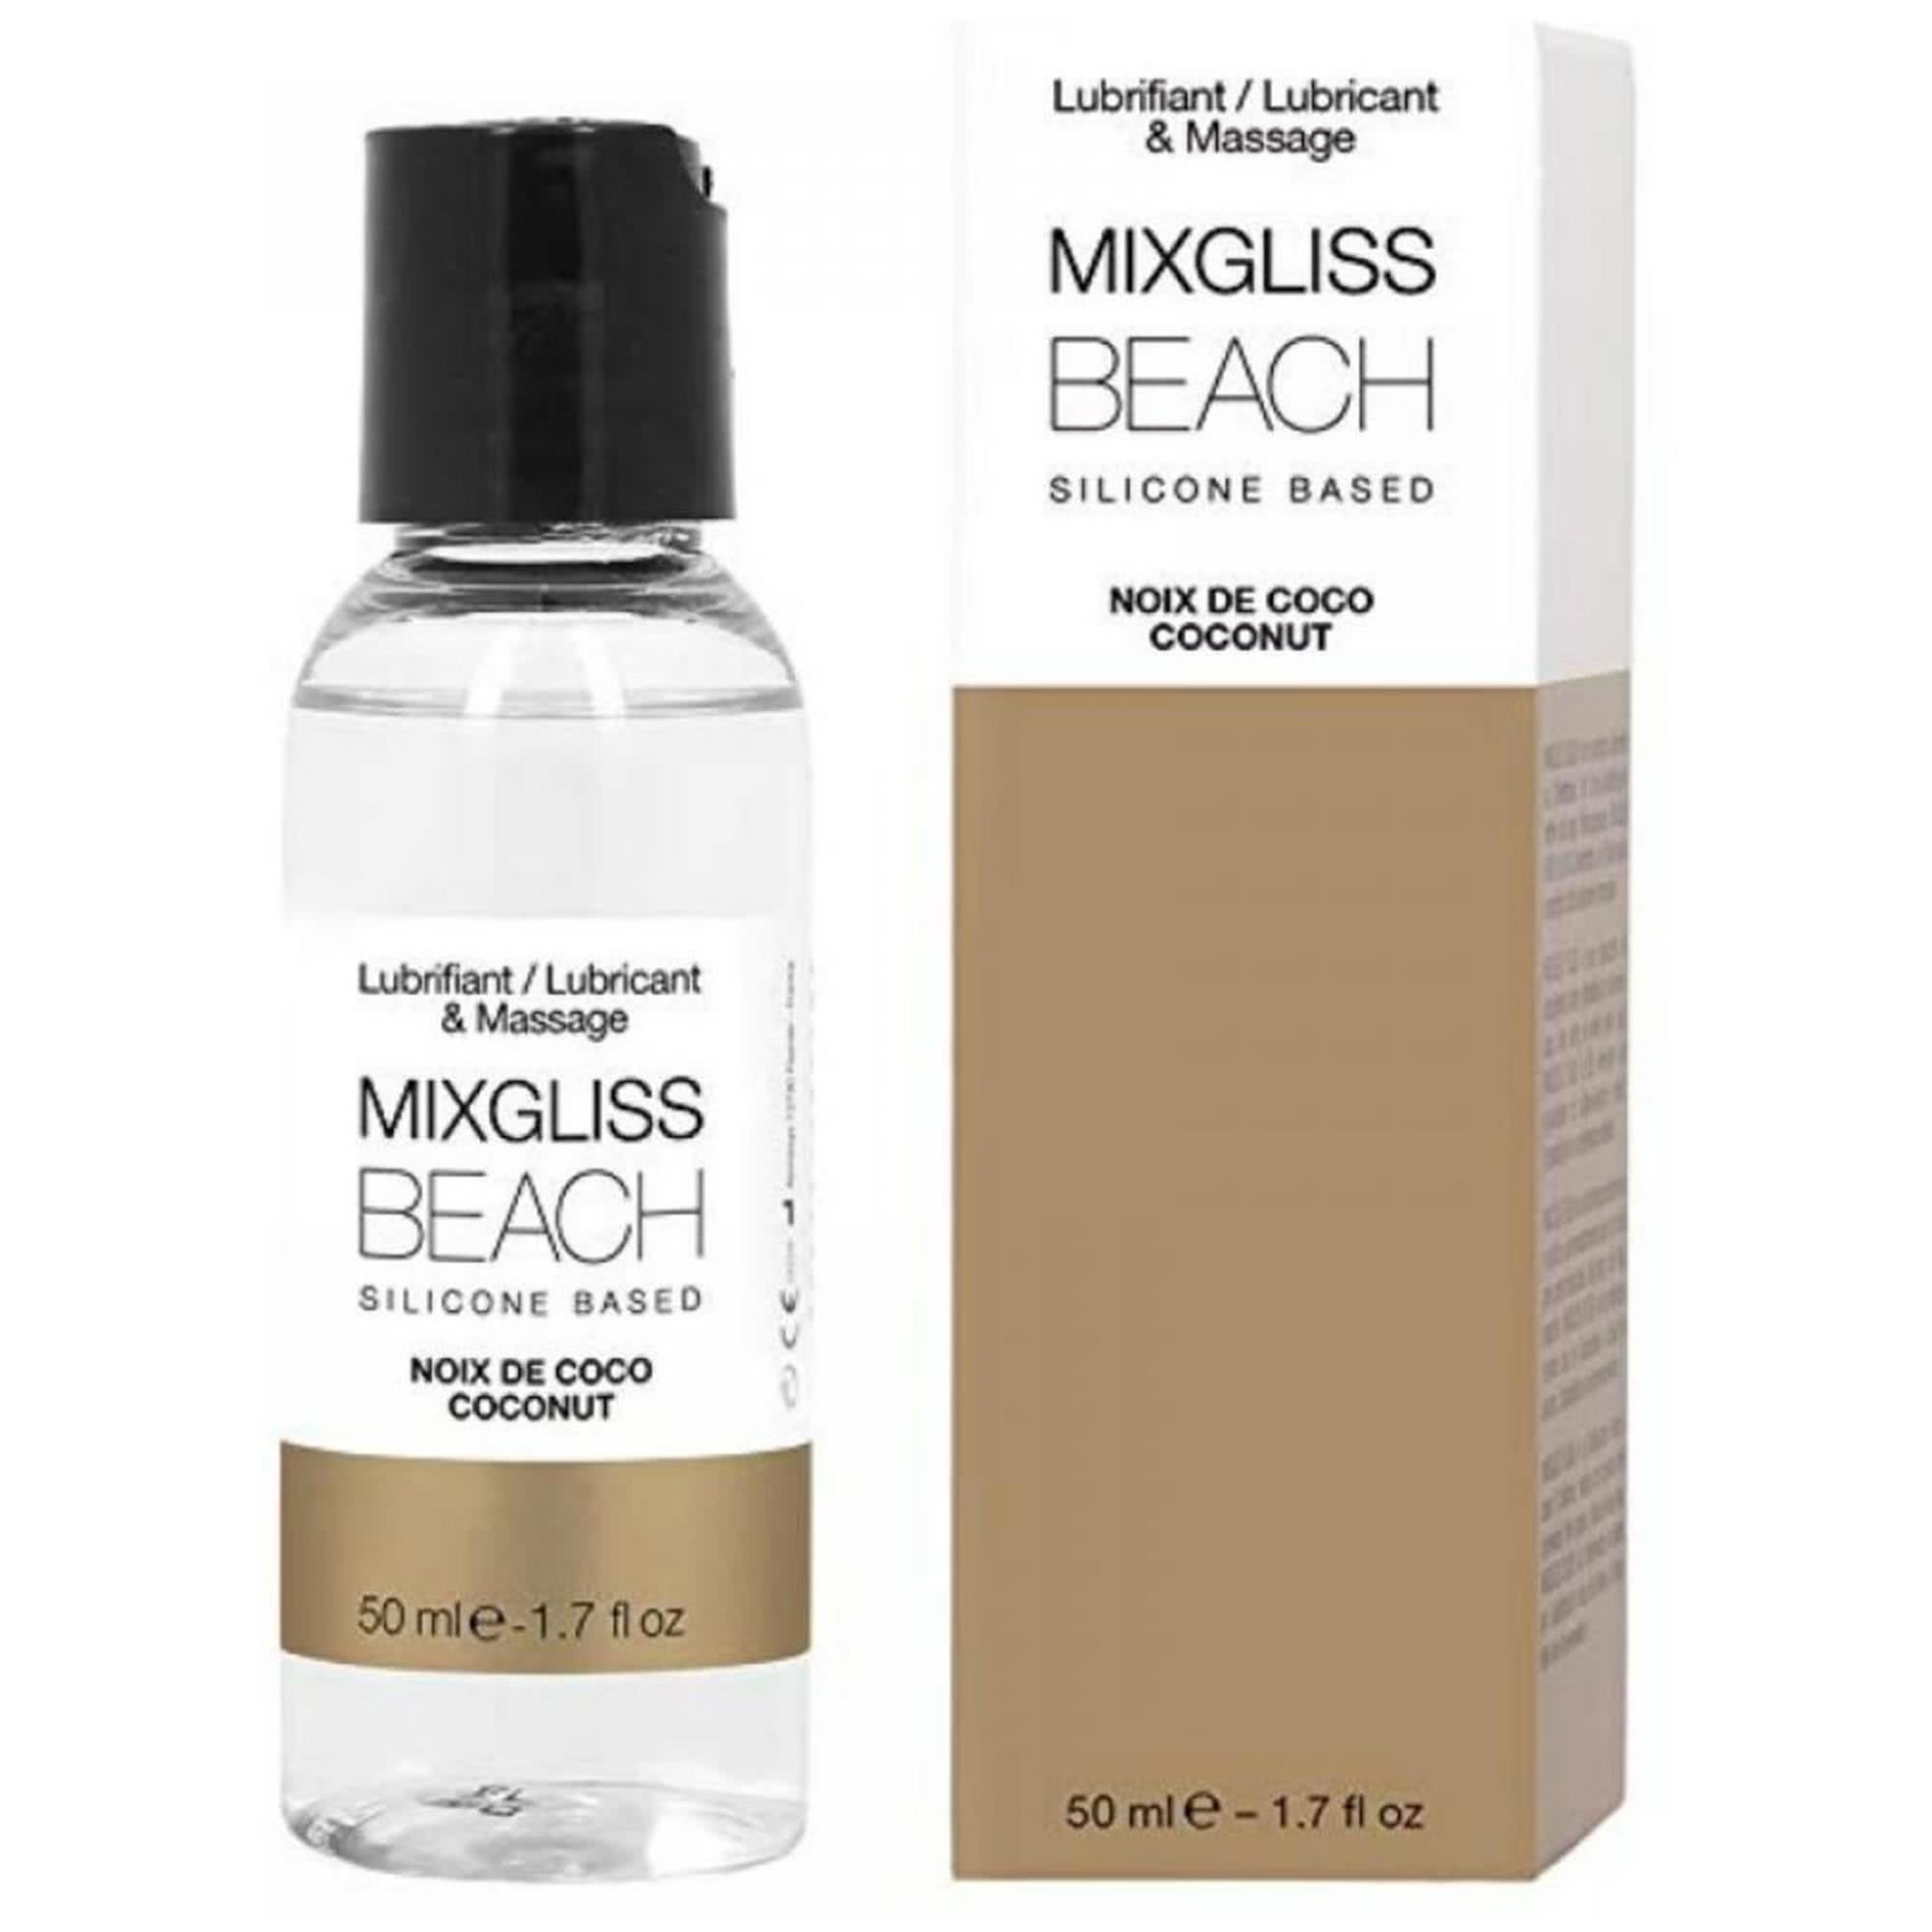 MIXGLISS Silicone Beach Coconut 50ml | Apotek, Glidmedel, Silikonbaserat glidmedel | Intimast.se - Sexleksaker